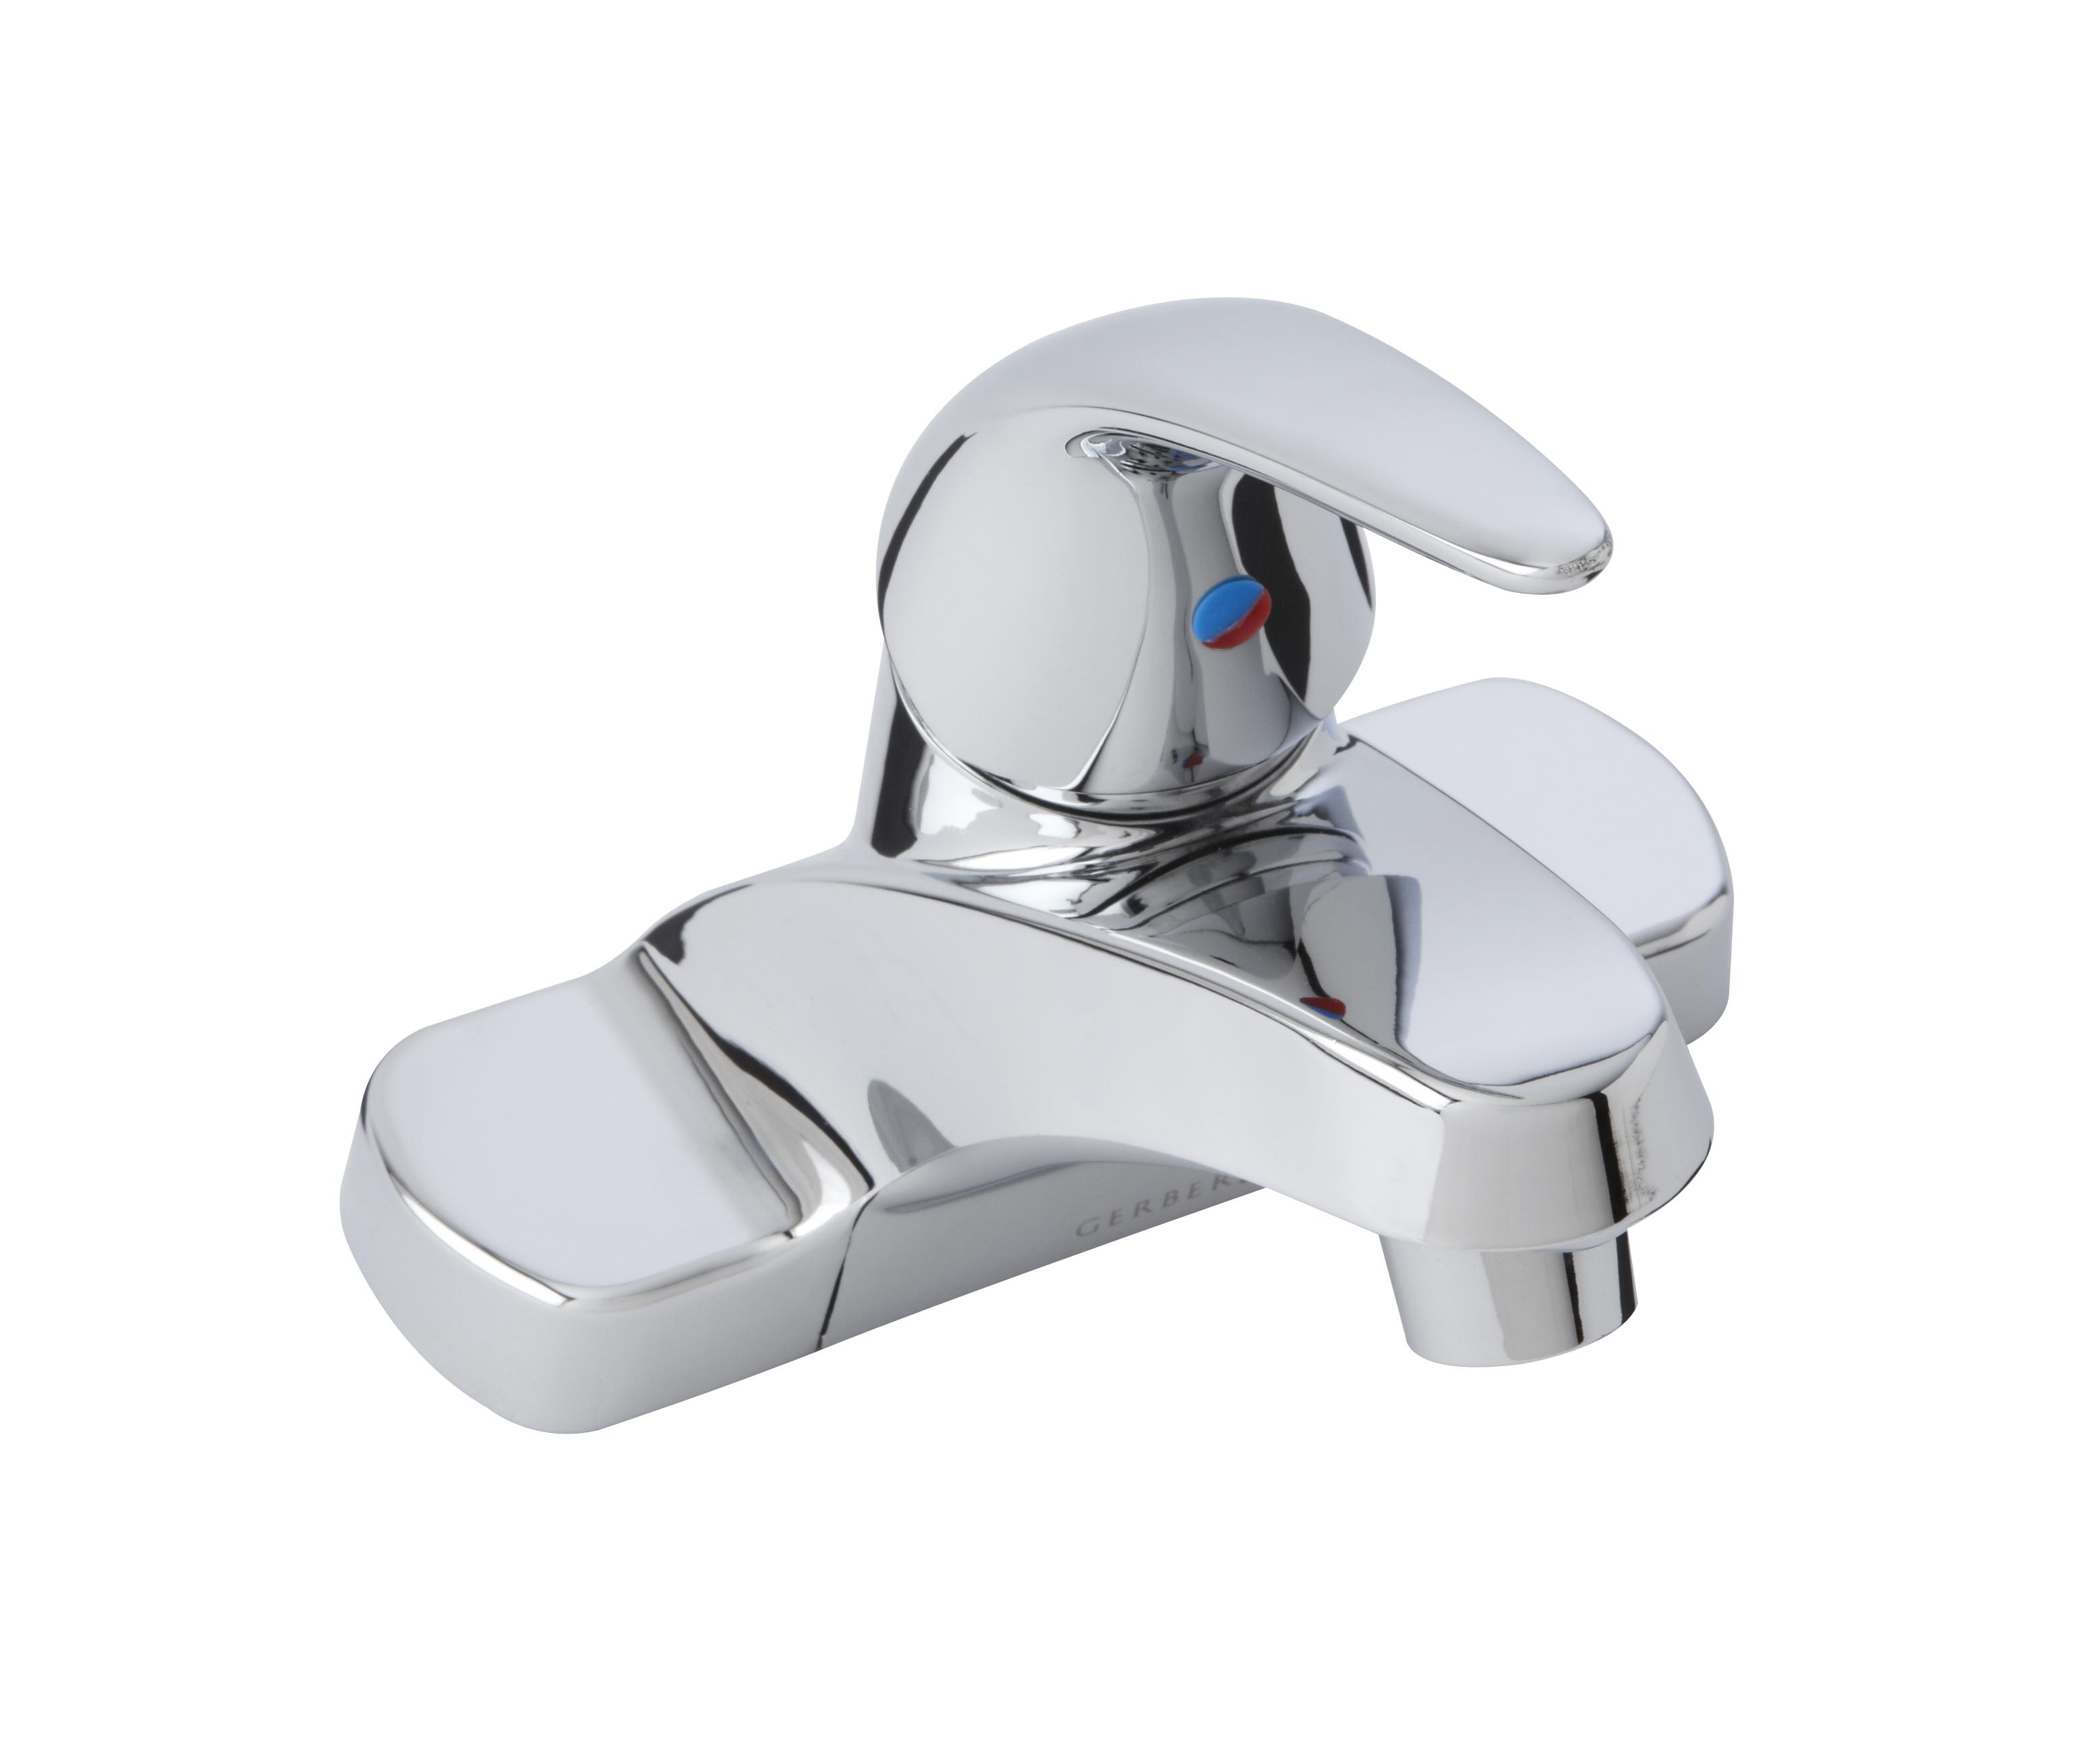 DISCONTINUED Maxwell® Single Handle Bathroom Faucet | Gerber Plumbing